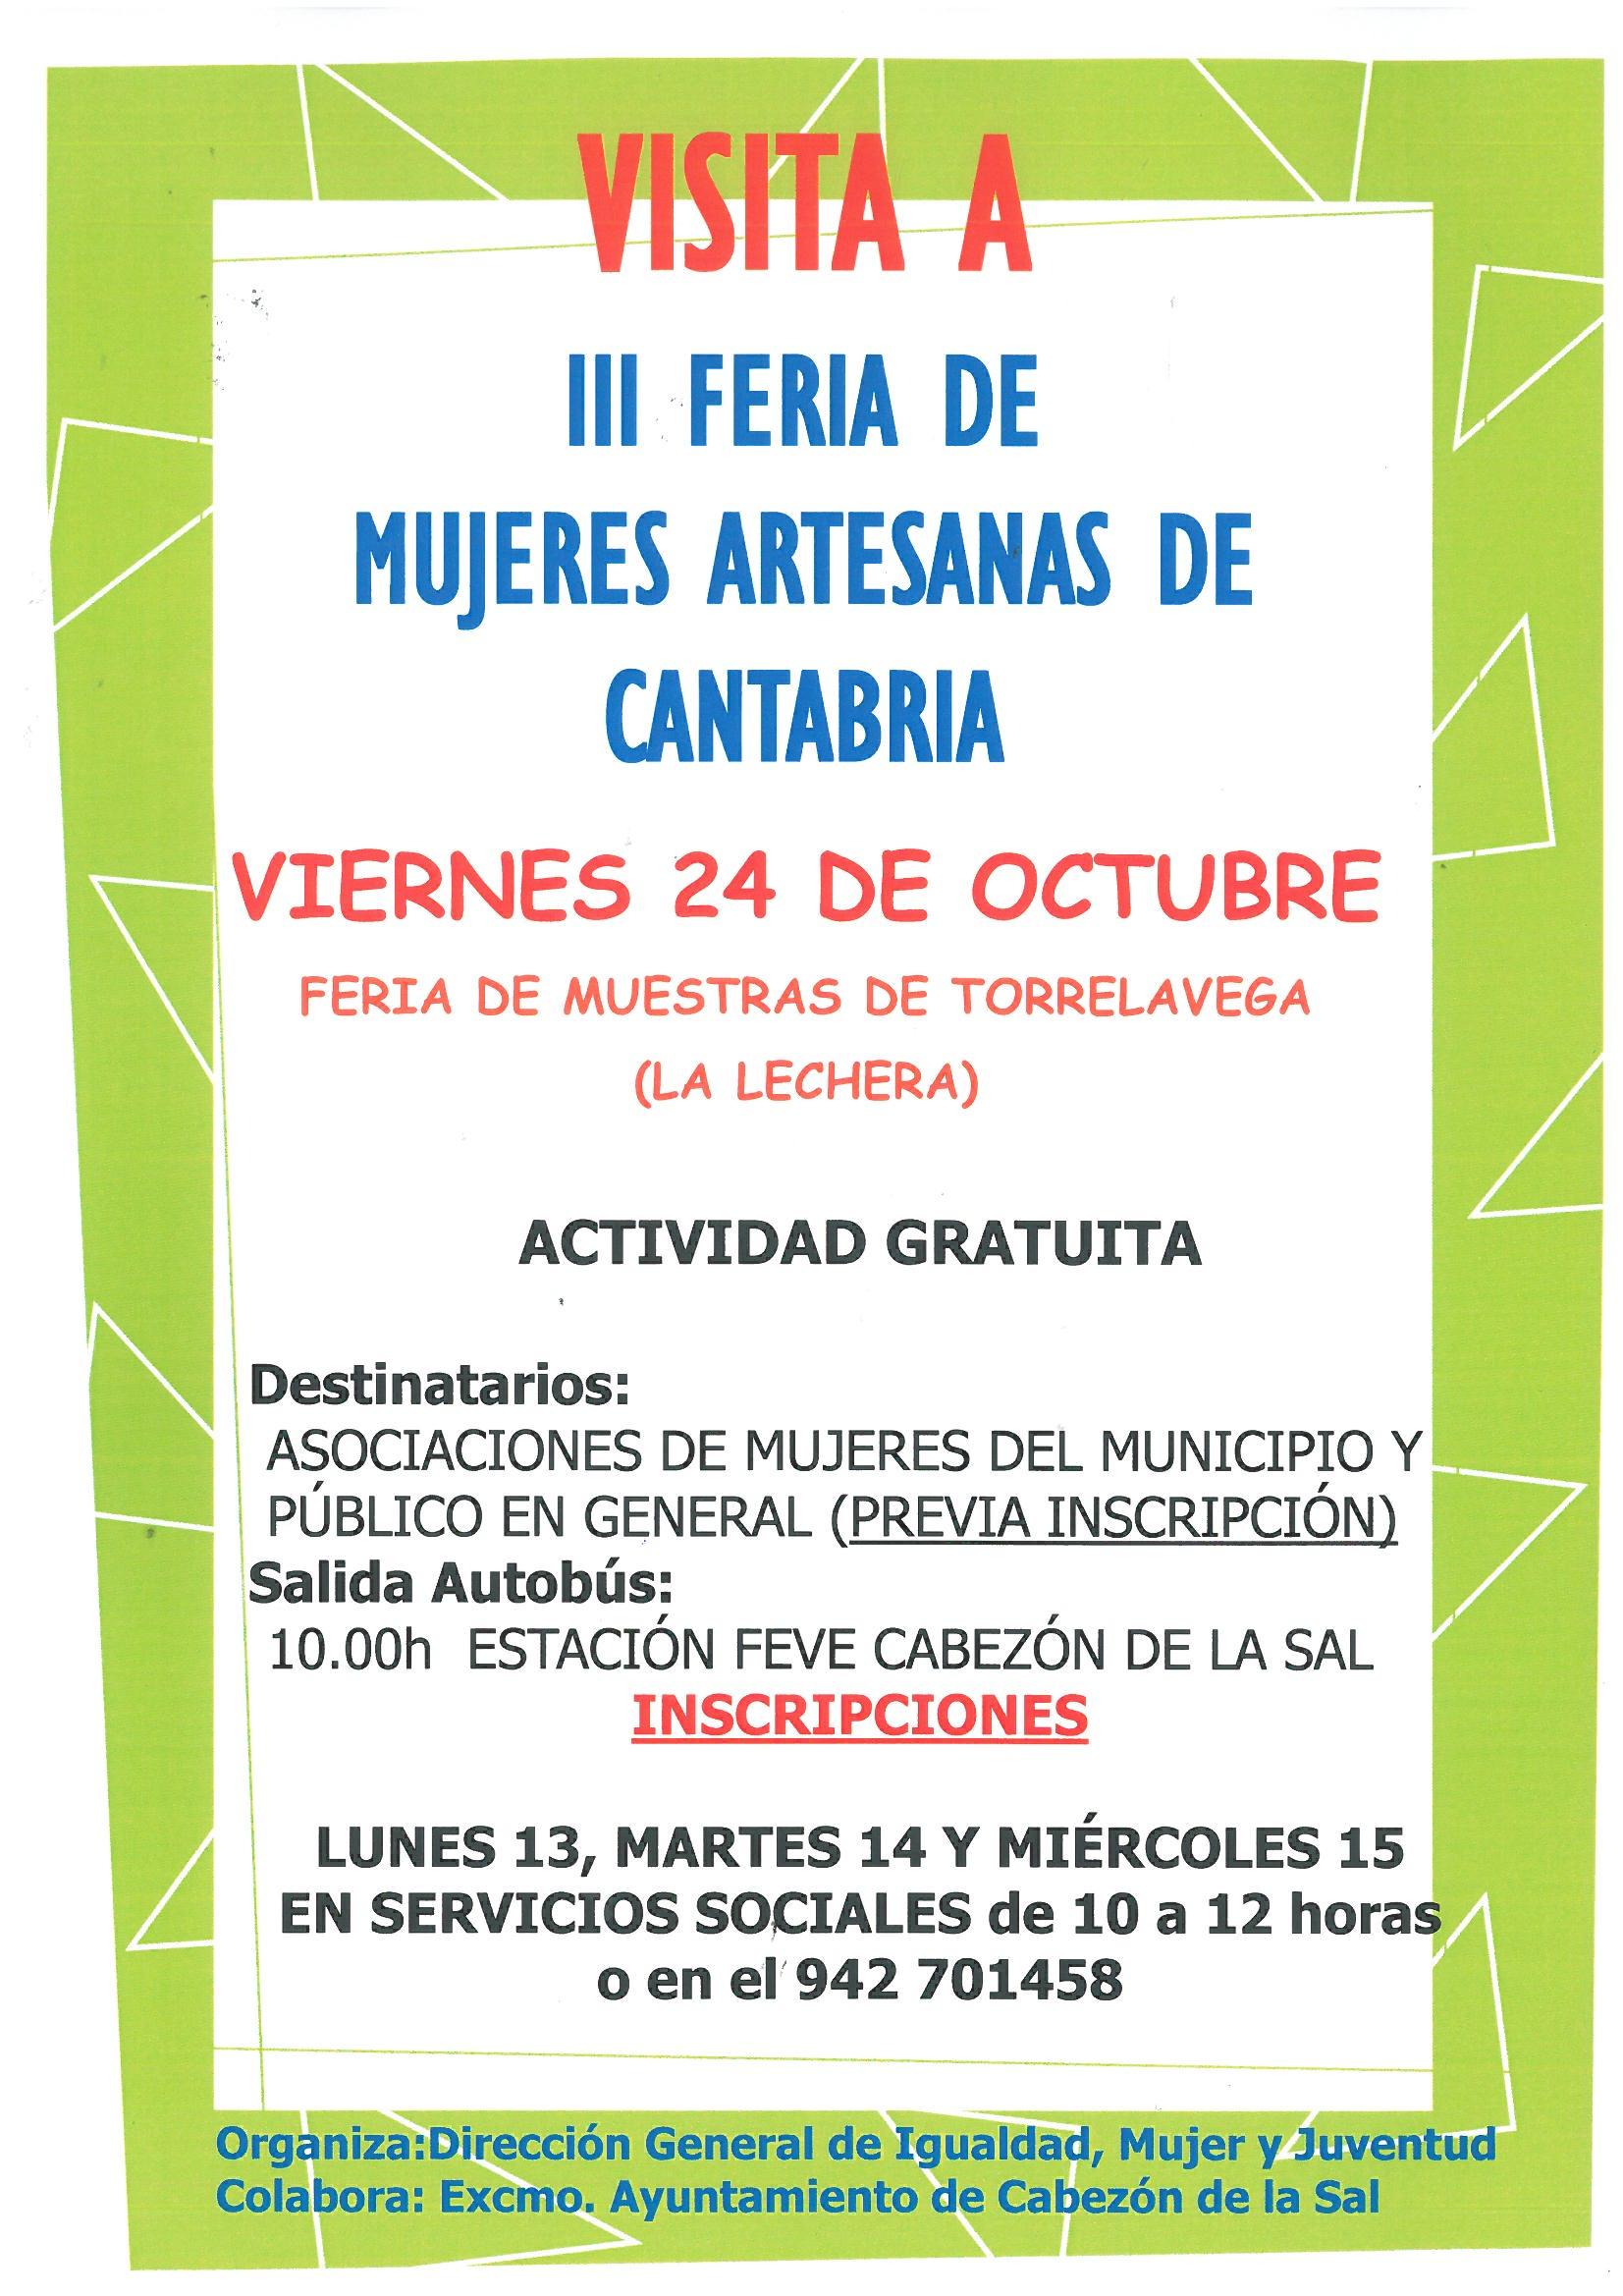 http://www.cabezondelasal.net/wp-content/uploads/2014/10/Cartel-Visita-Feria-de-Artesanas-Torrelavega.jpg